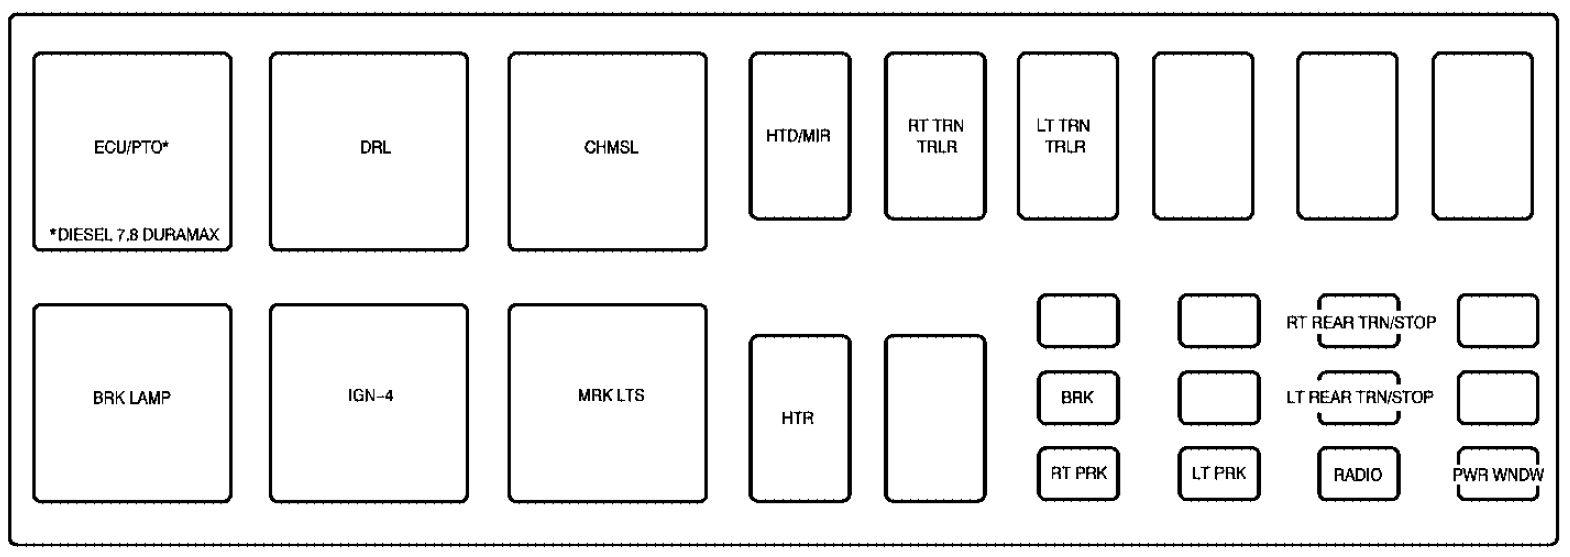 1998 Gmc C7500 Wiring Diagram